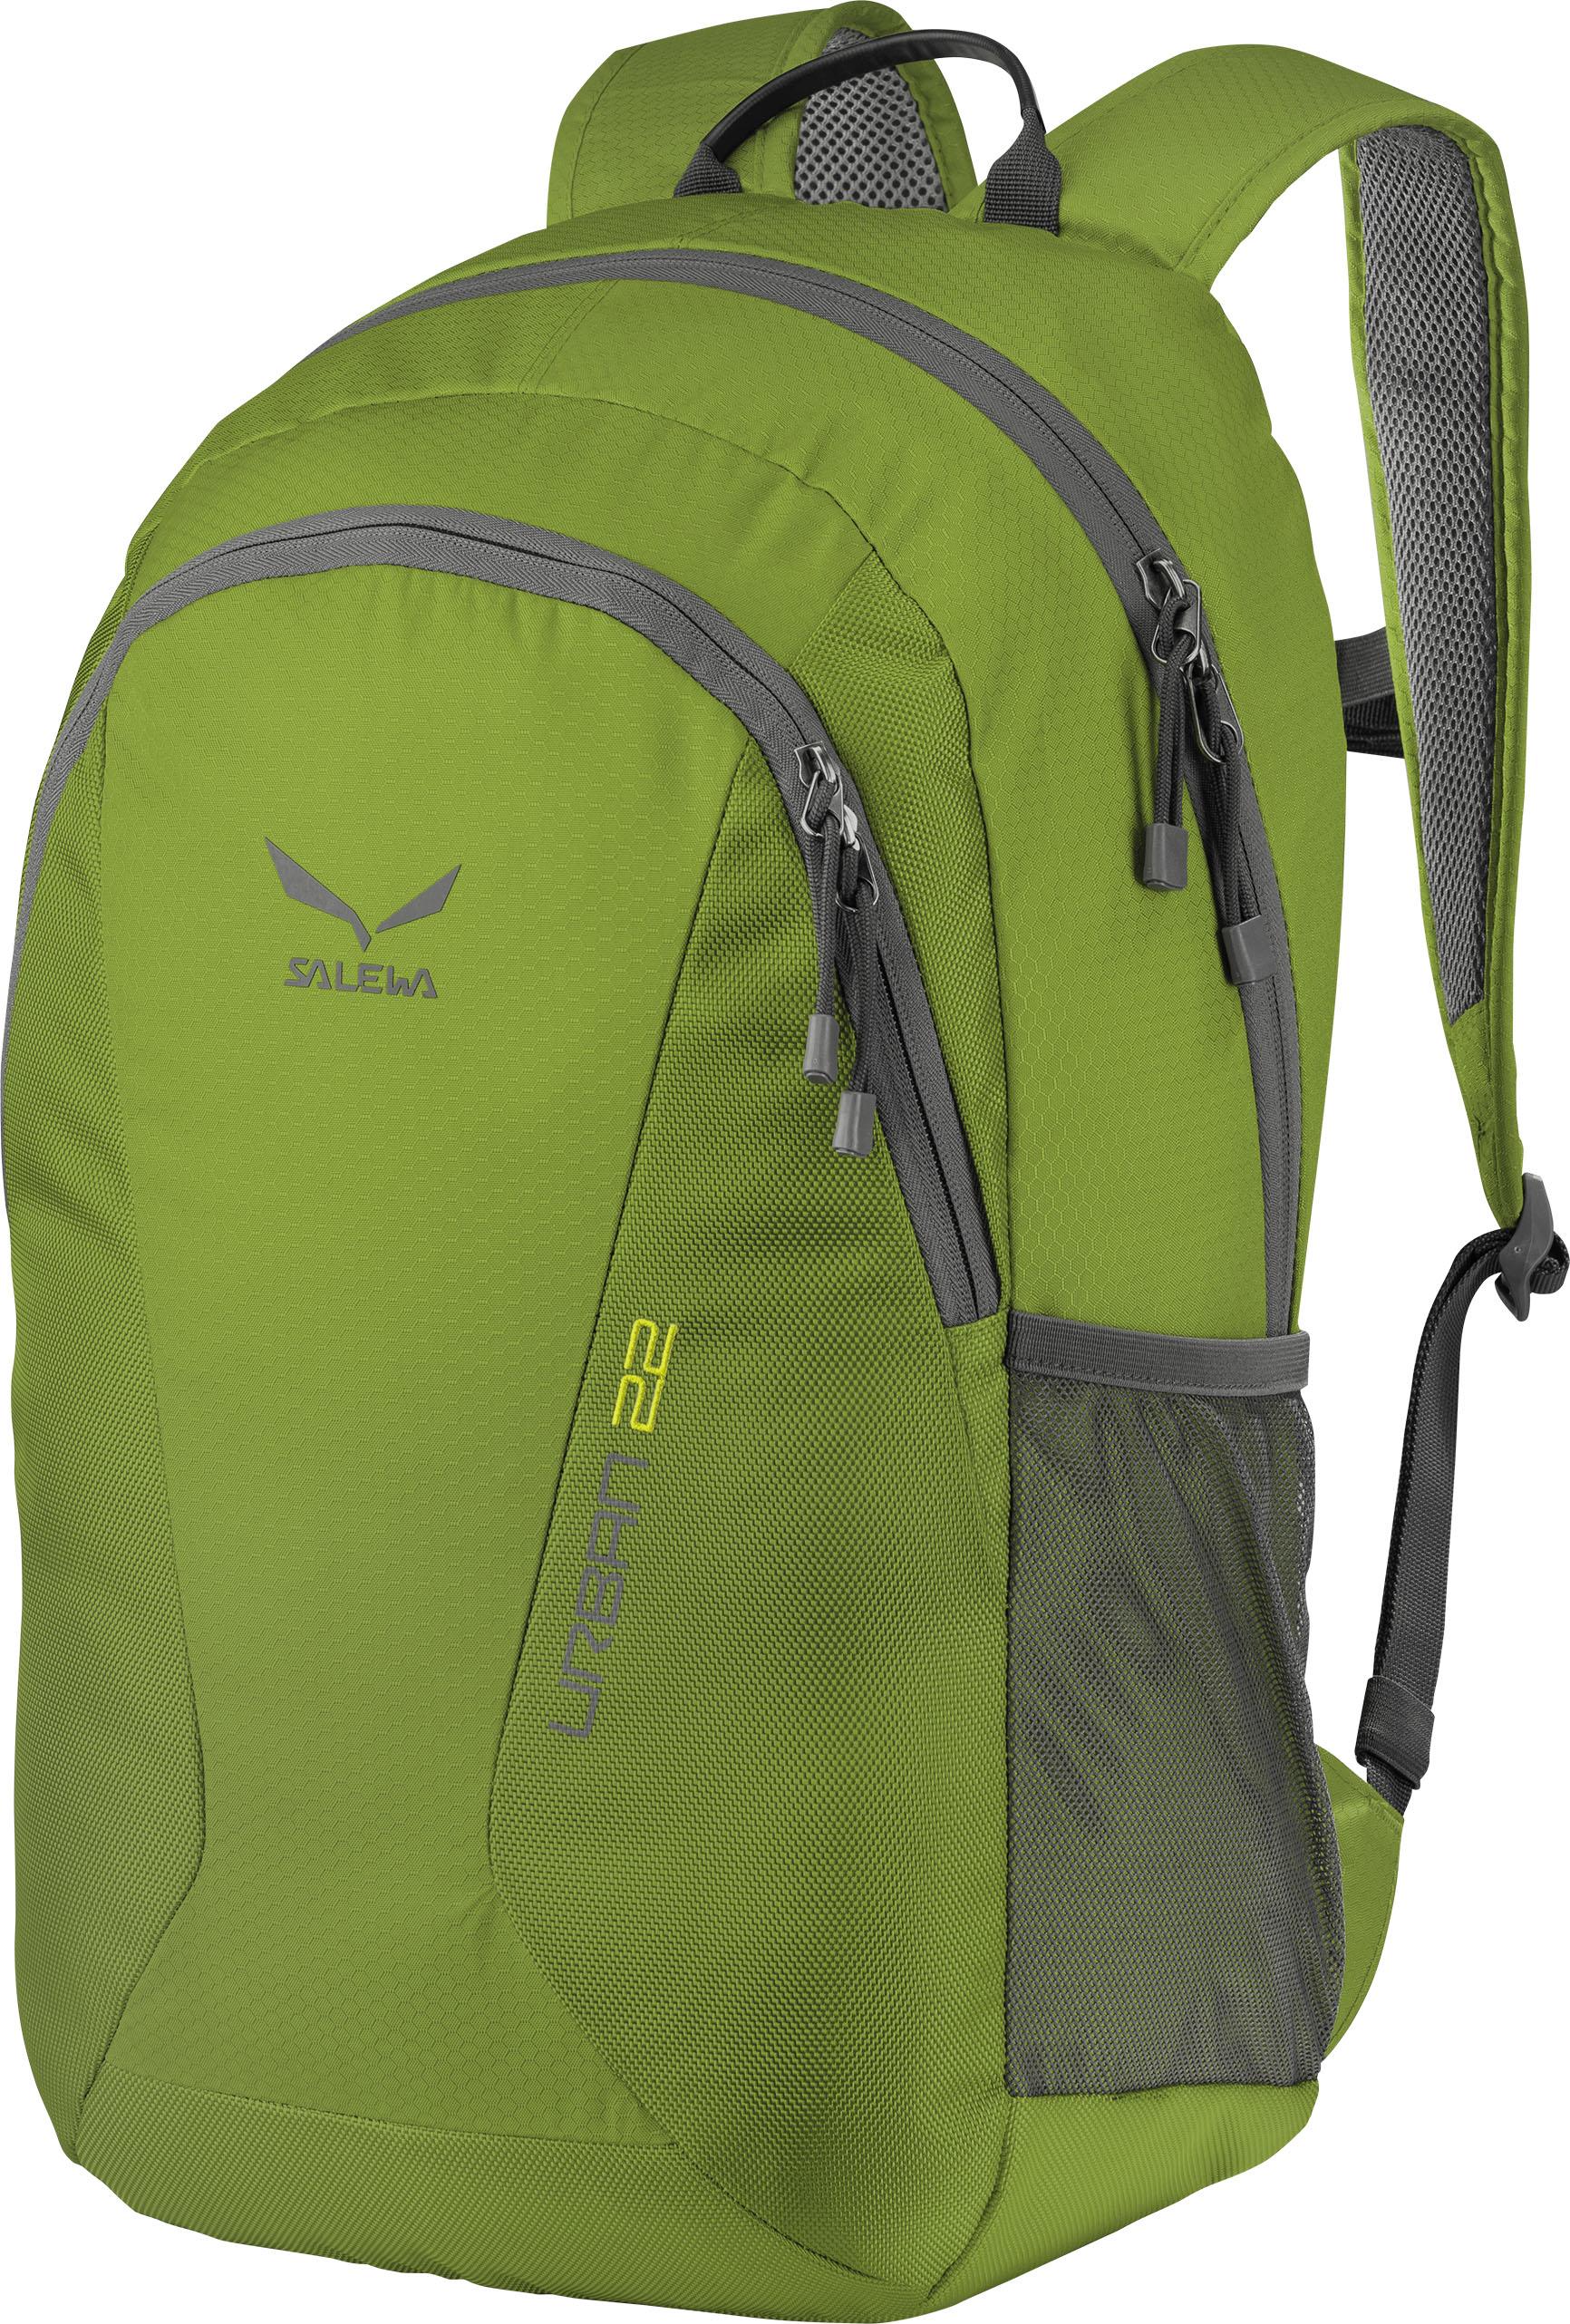 Купить Рюкзак Salewa 2015 Daypacks URBAN 22 BP MACAW GREEN / Рюкзаки городские 1166640